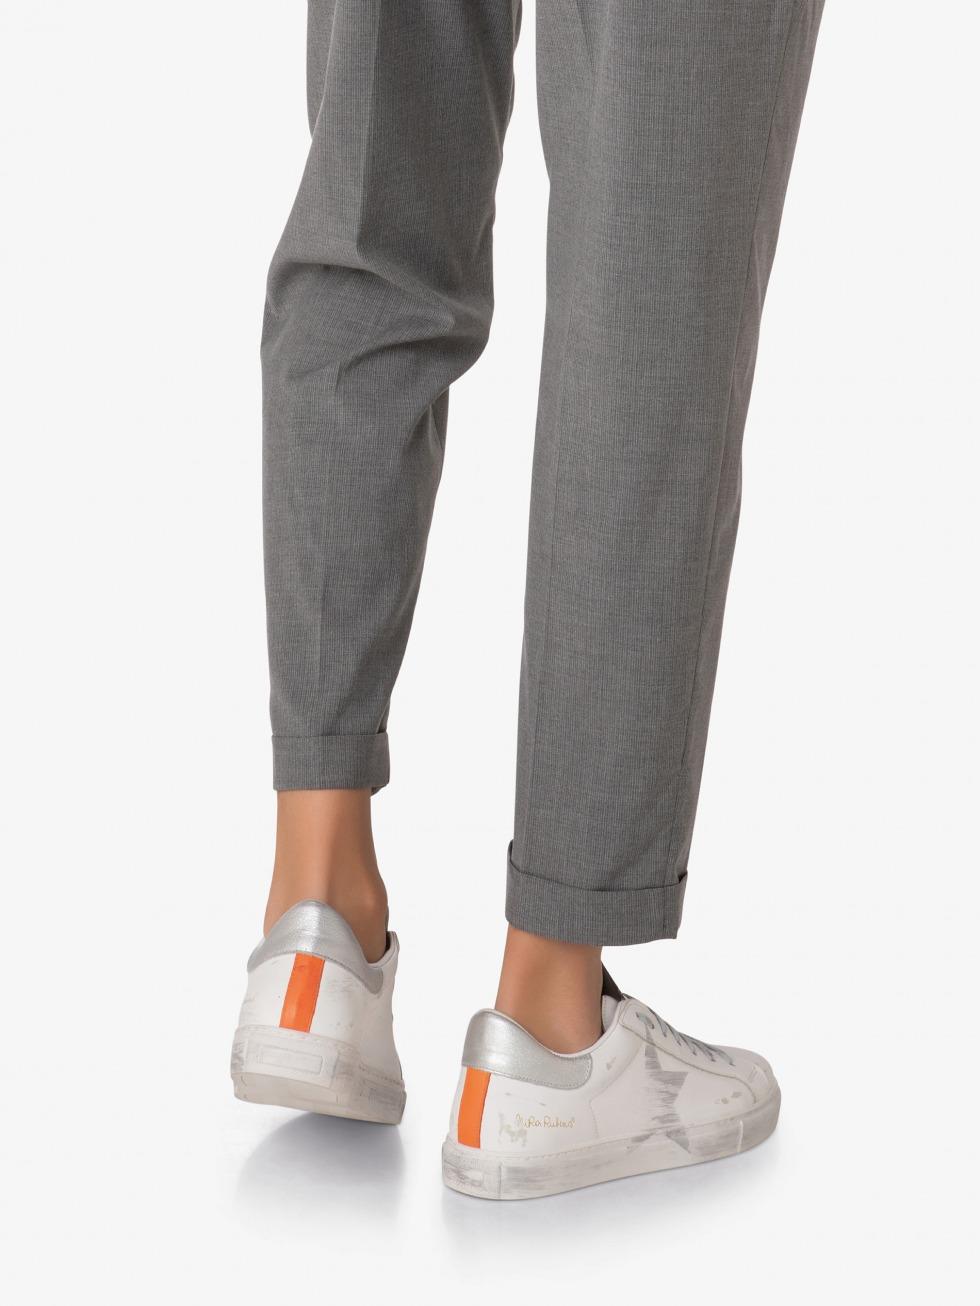 Martini M Sneakers - Vintage Orange Silver Star